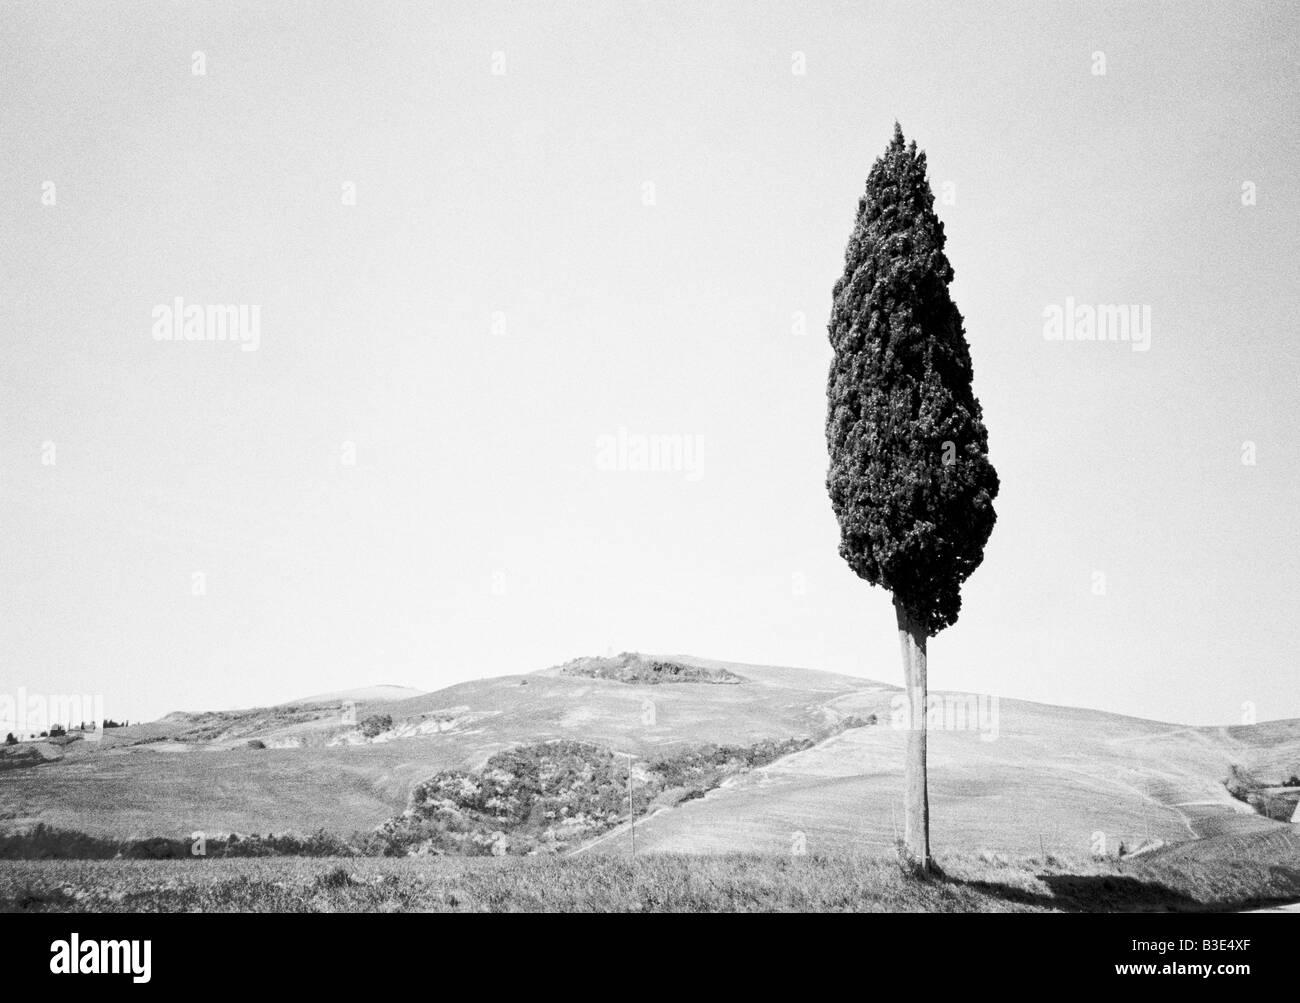 Tuscany Italy black & white landscape with a single tree - Stock Image